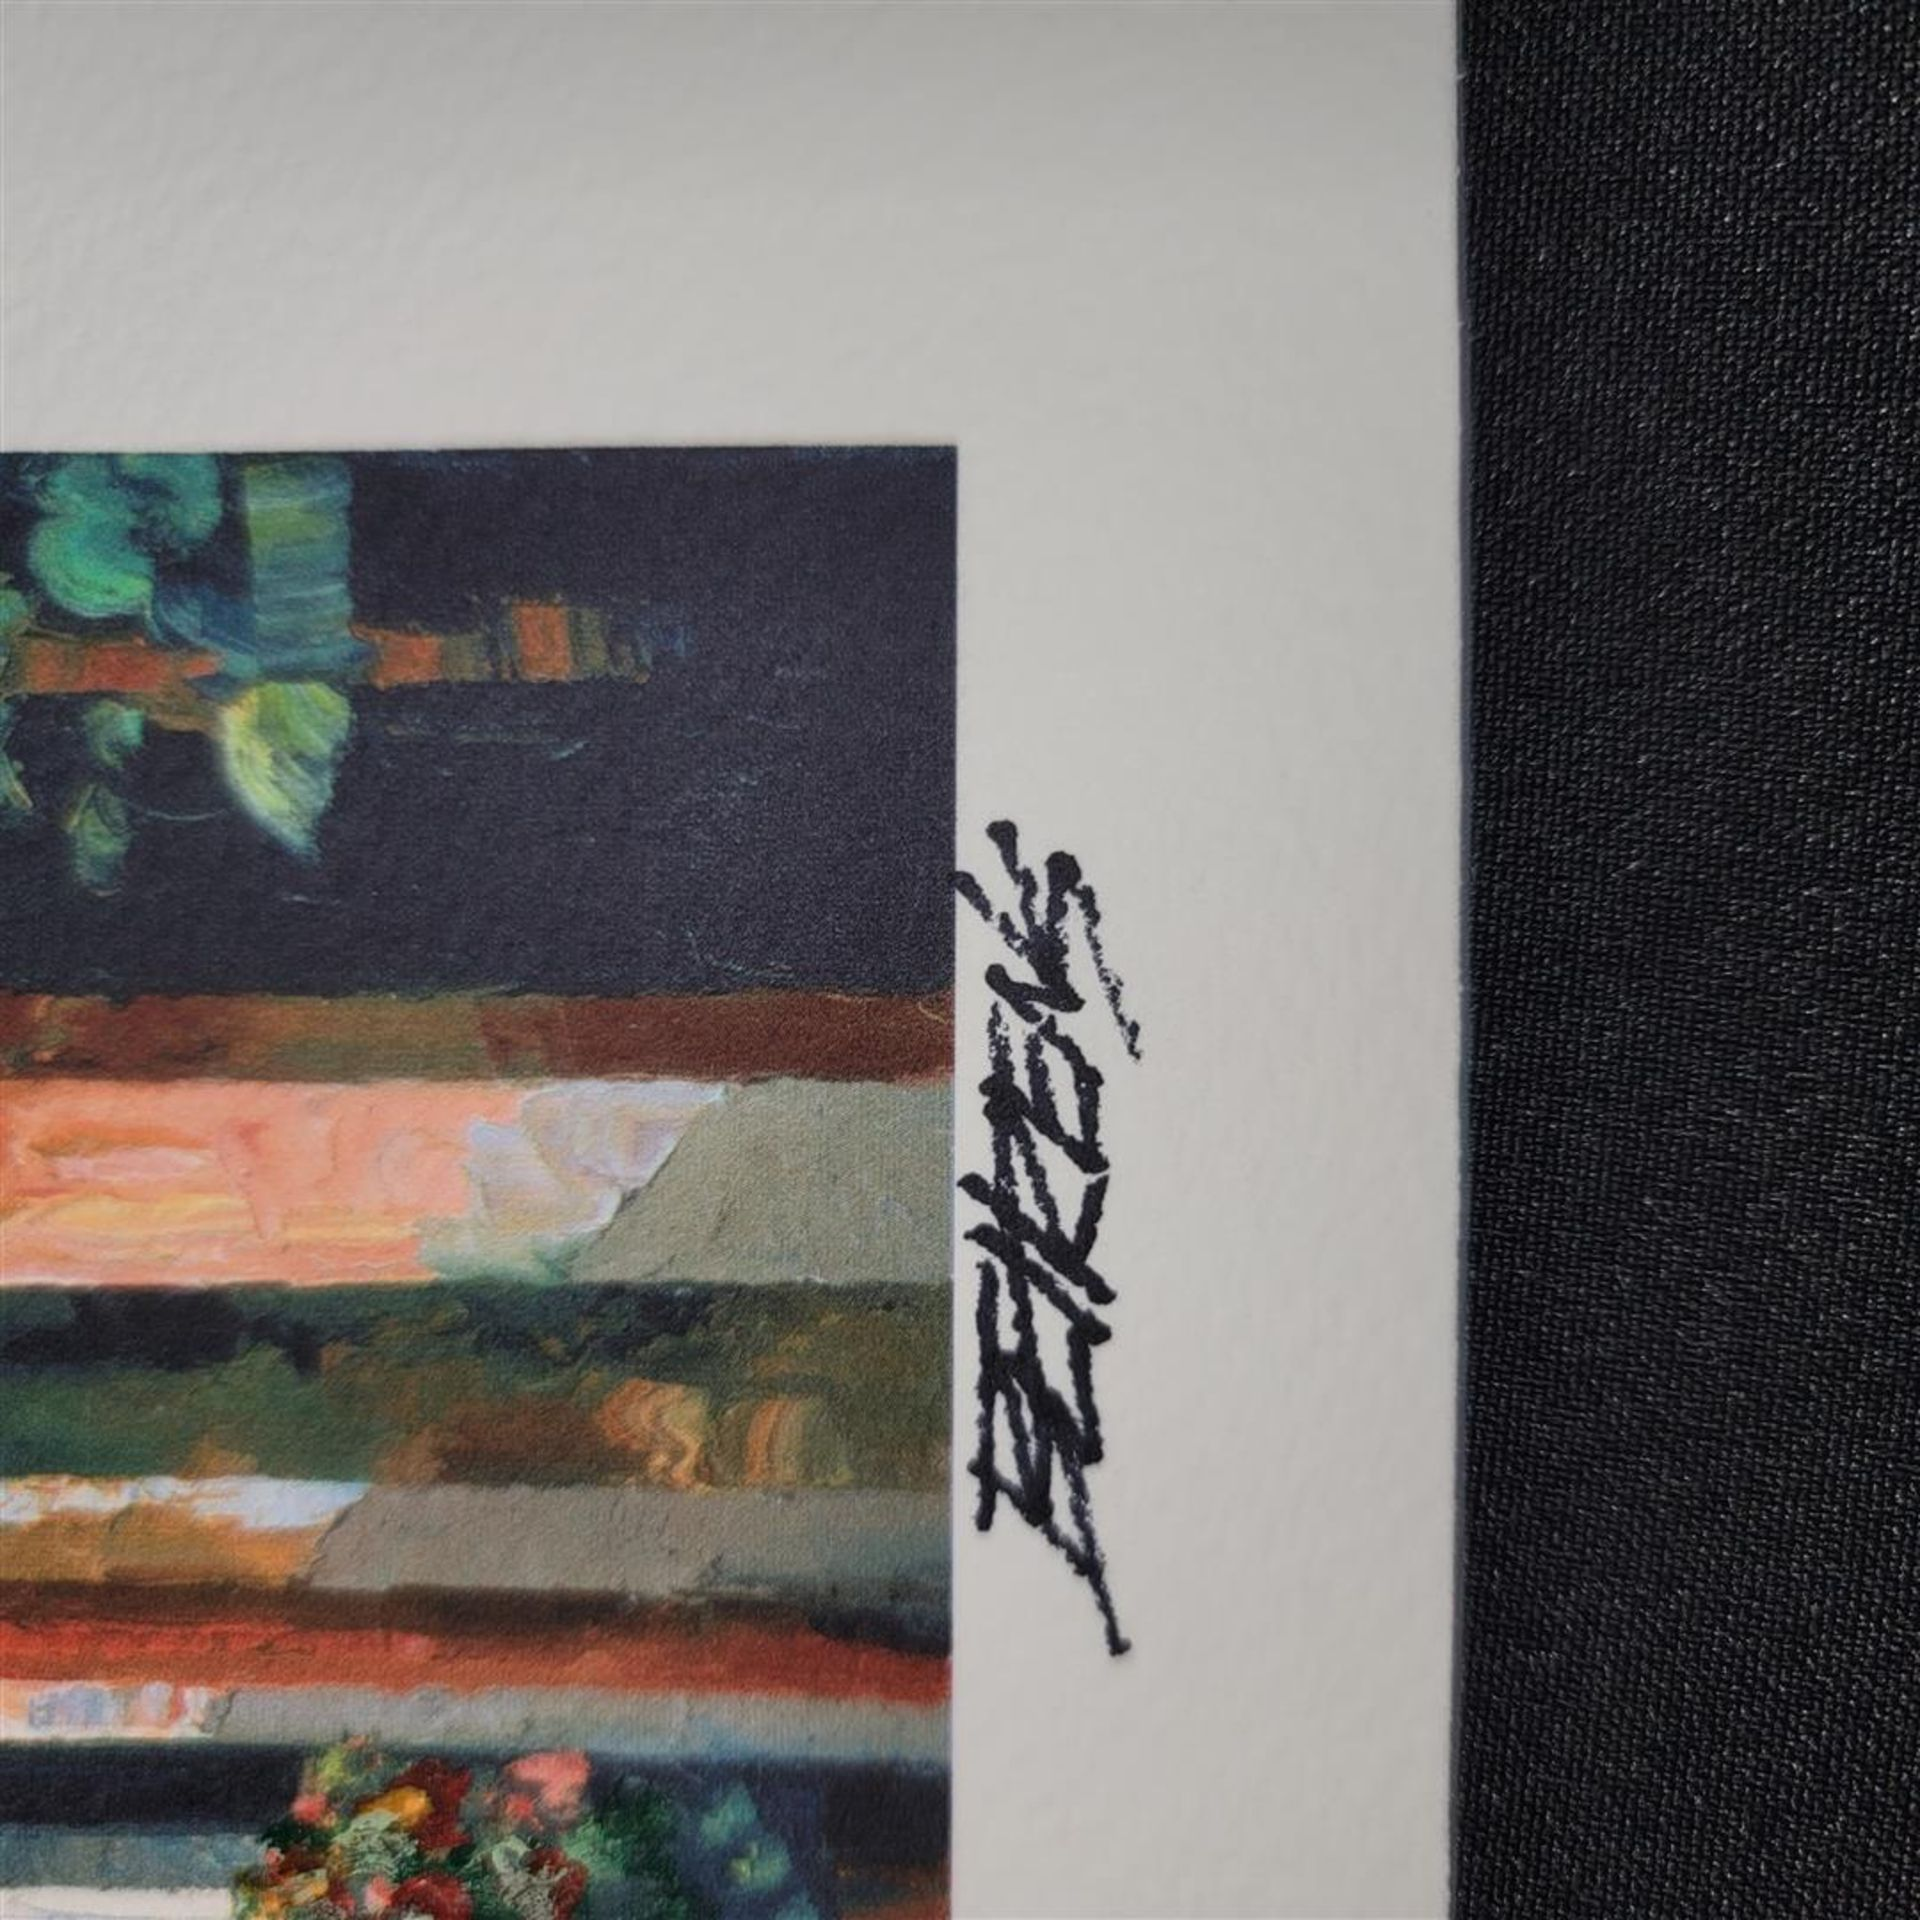 """Village Hideaway"" by Howard Behrens - Signed, Numbered, & Embellished - Image 2 of 4"